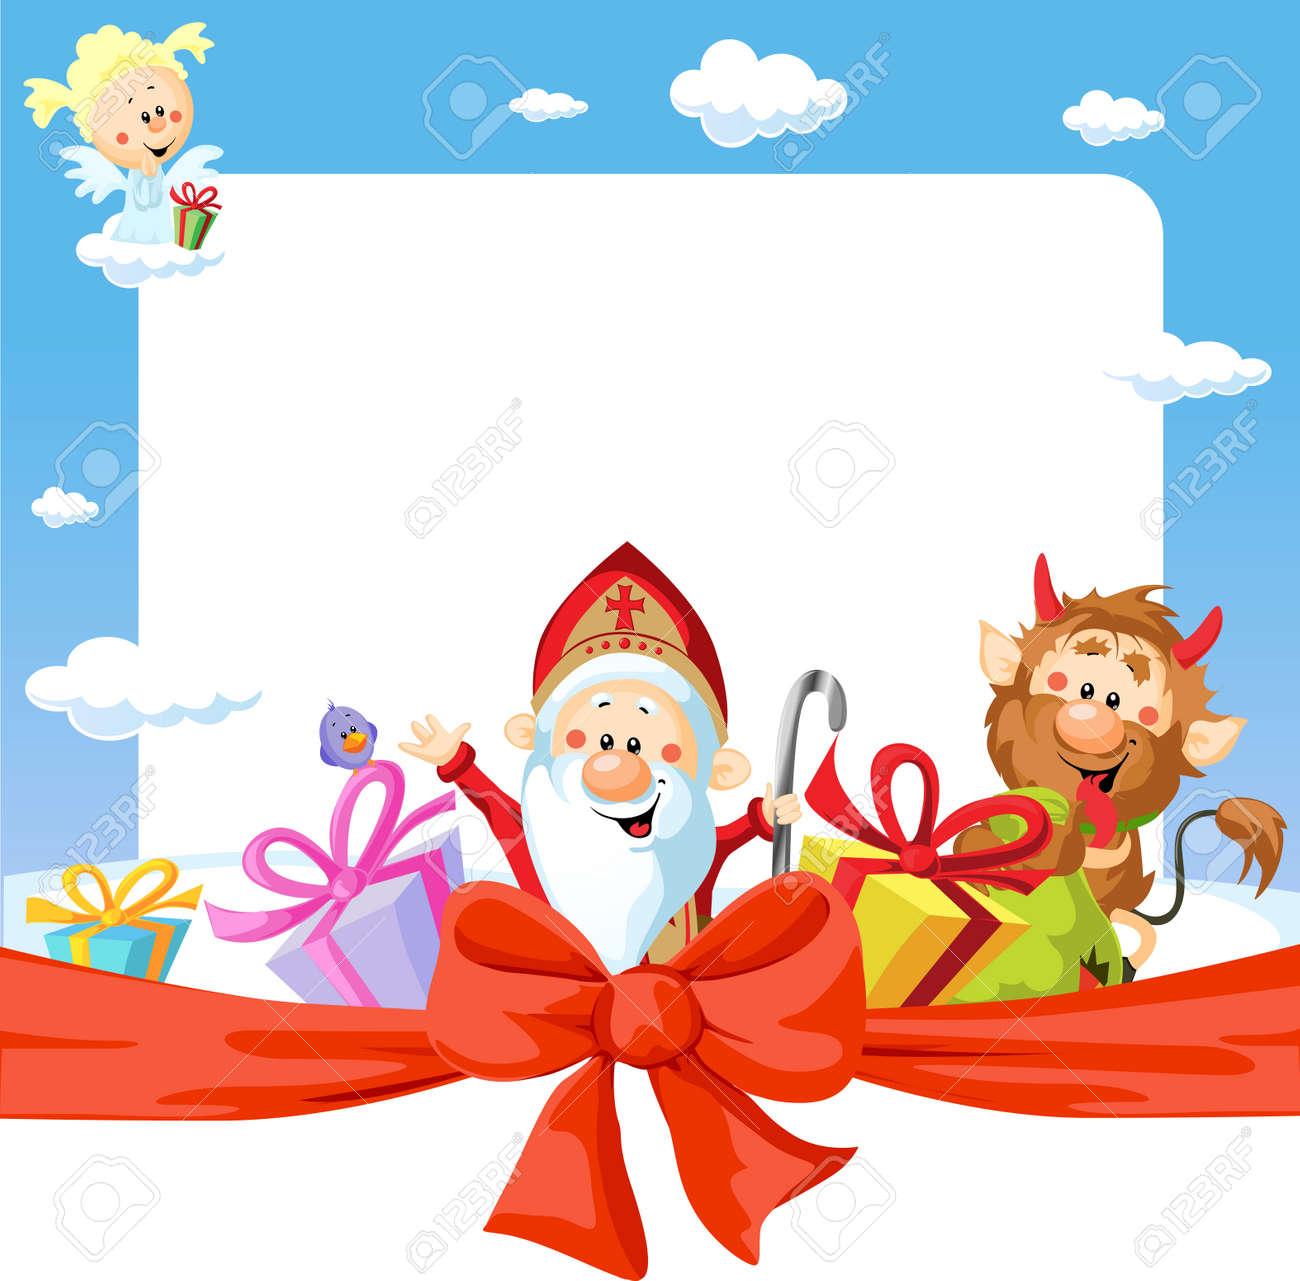 saint nicholas frame - funny vector background illustration - 34680259